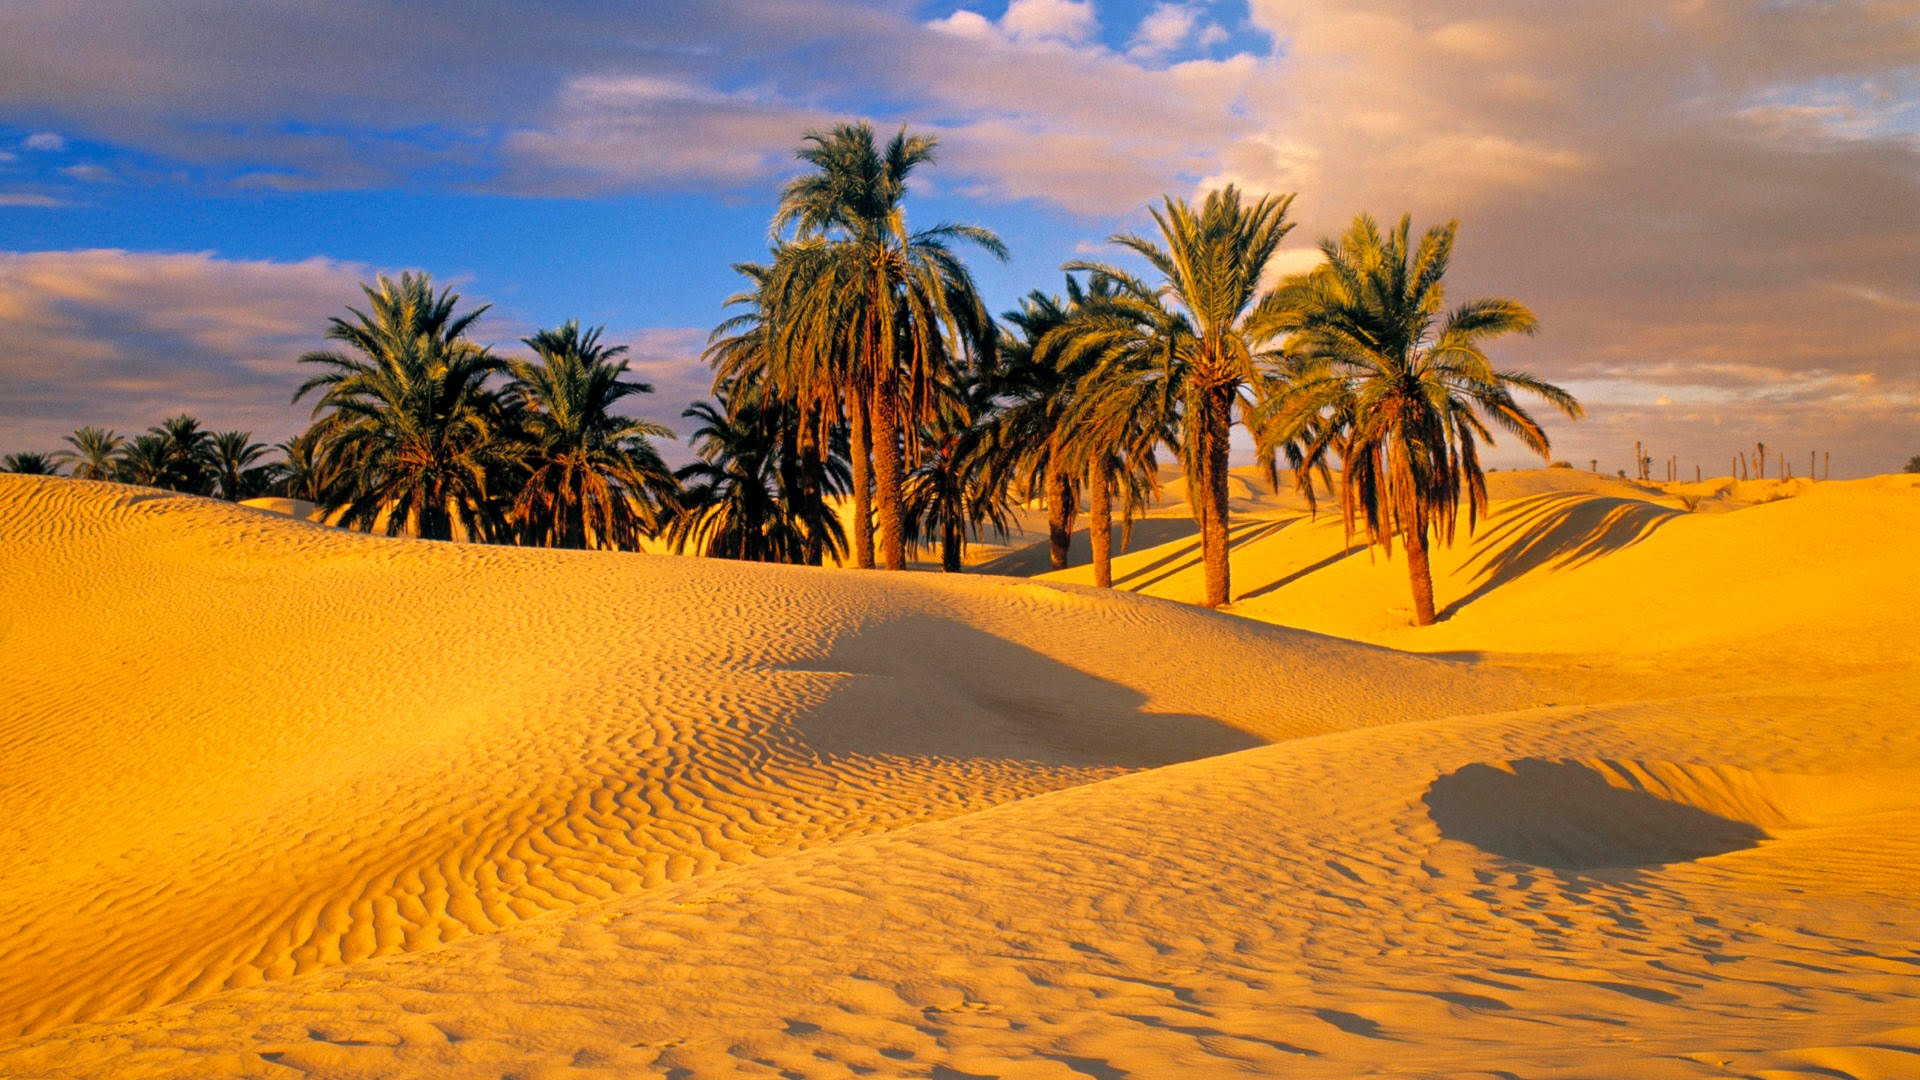 palm trees in the desert fond d 39 cran hd arri re plan 1920x1080 id 692907 wallpaper abyss. Black Bedroom Furniture Sets. Home Design Ideas